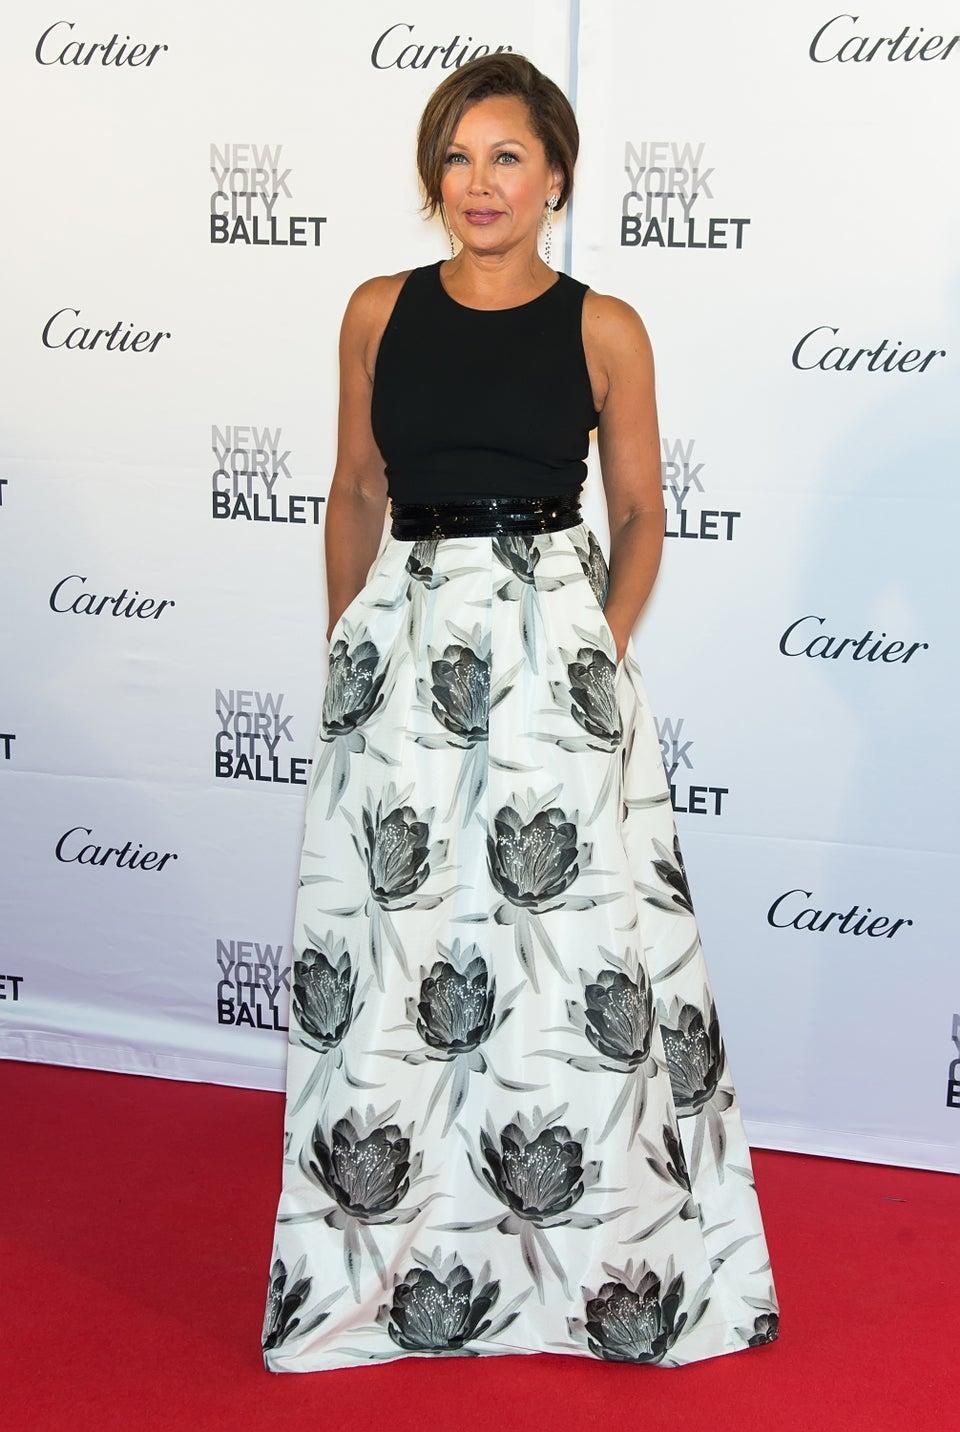 Vanessa Williams to Play Lead in Star Jones's 'Satan's Sisters'